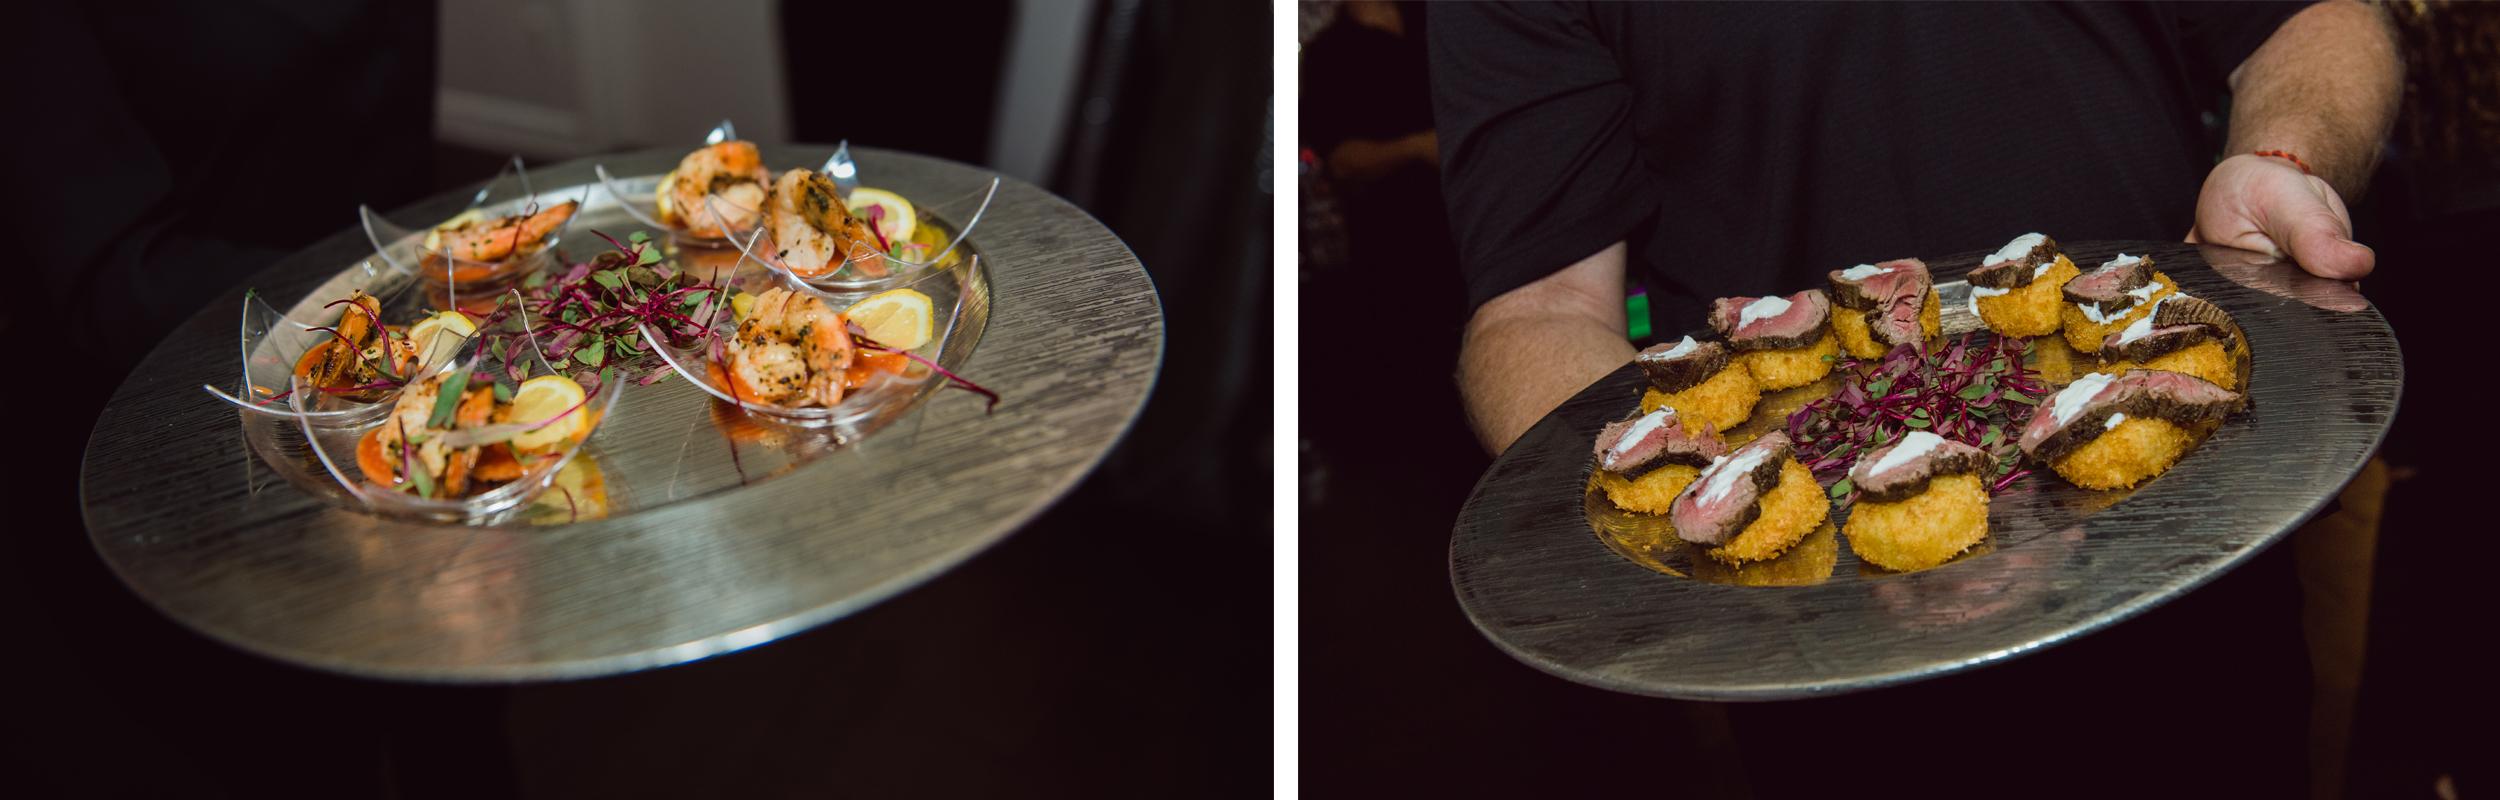 food photography.jpg